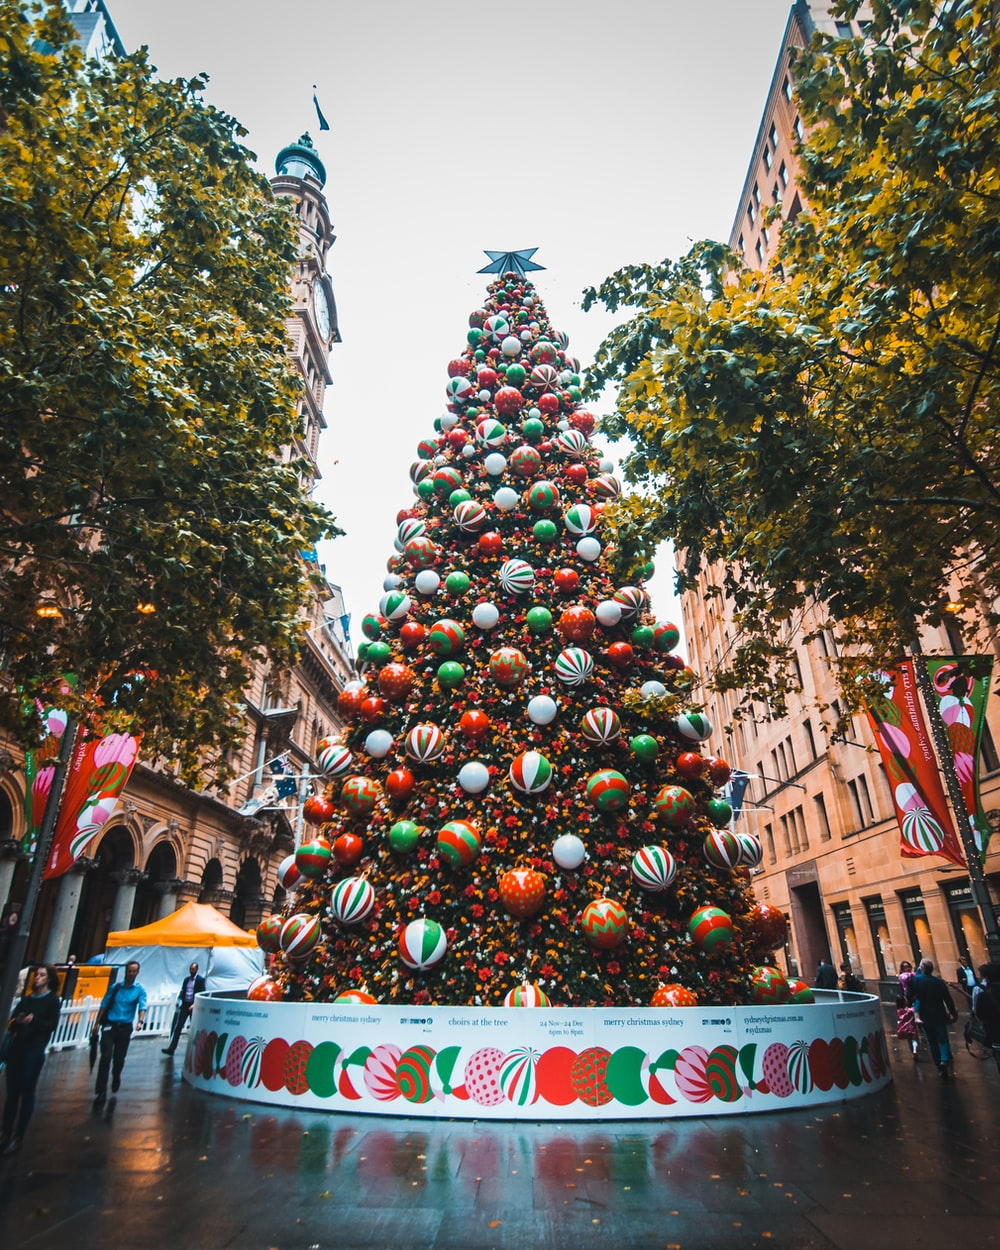 people walking beside Christmas baubles on large tree